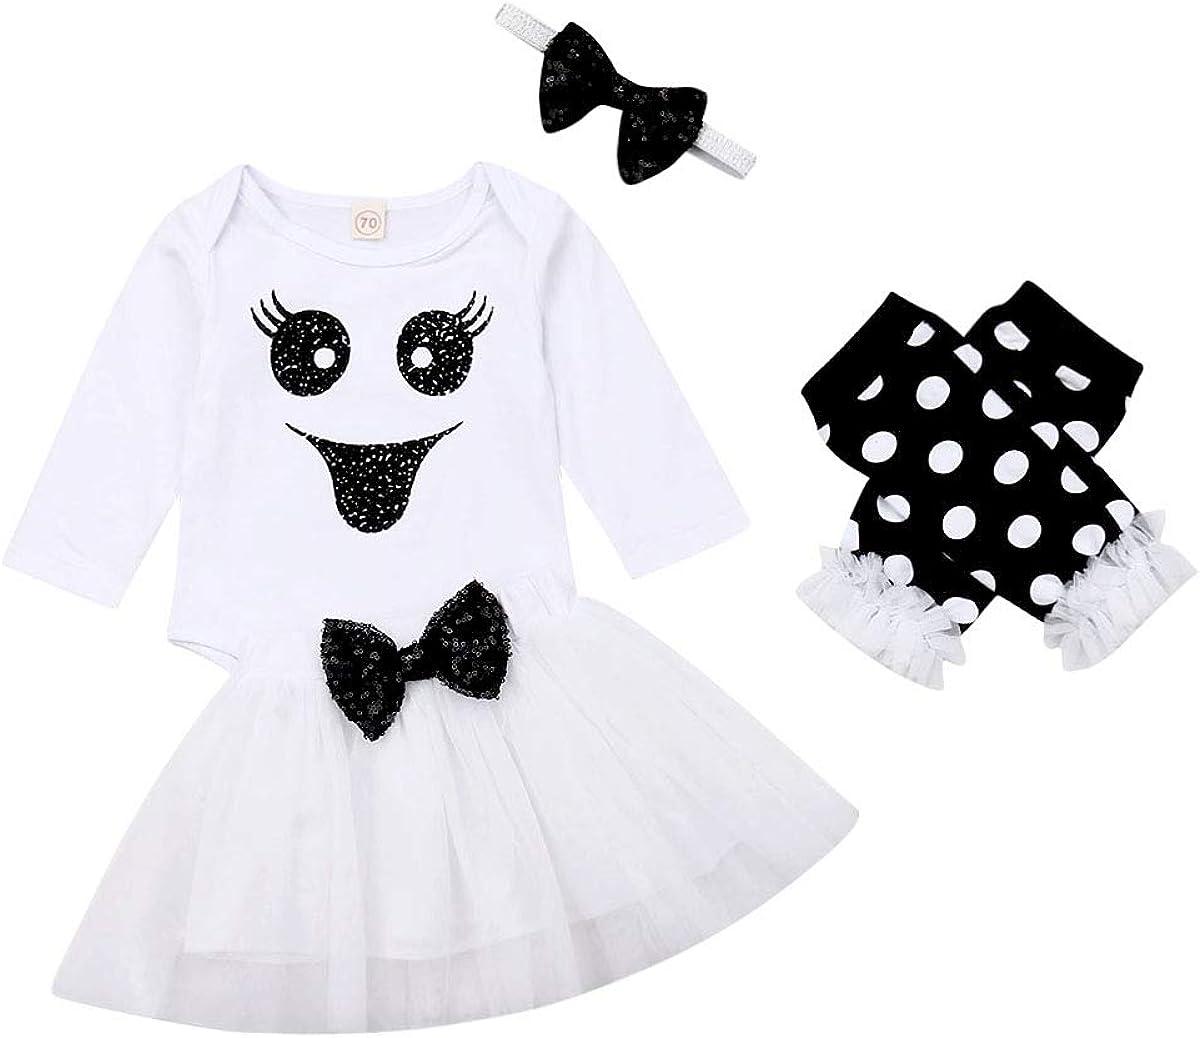 Infant Newborn Baby Girl Halloween Outfit Clothes Romper Tutu Skirt Leg Warmers Headband 3PCS Set